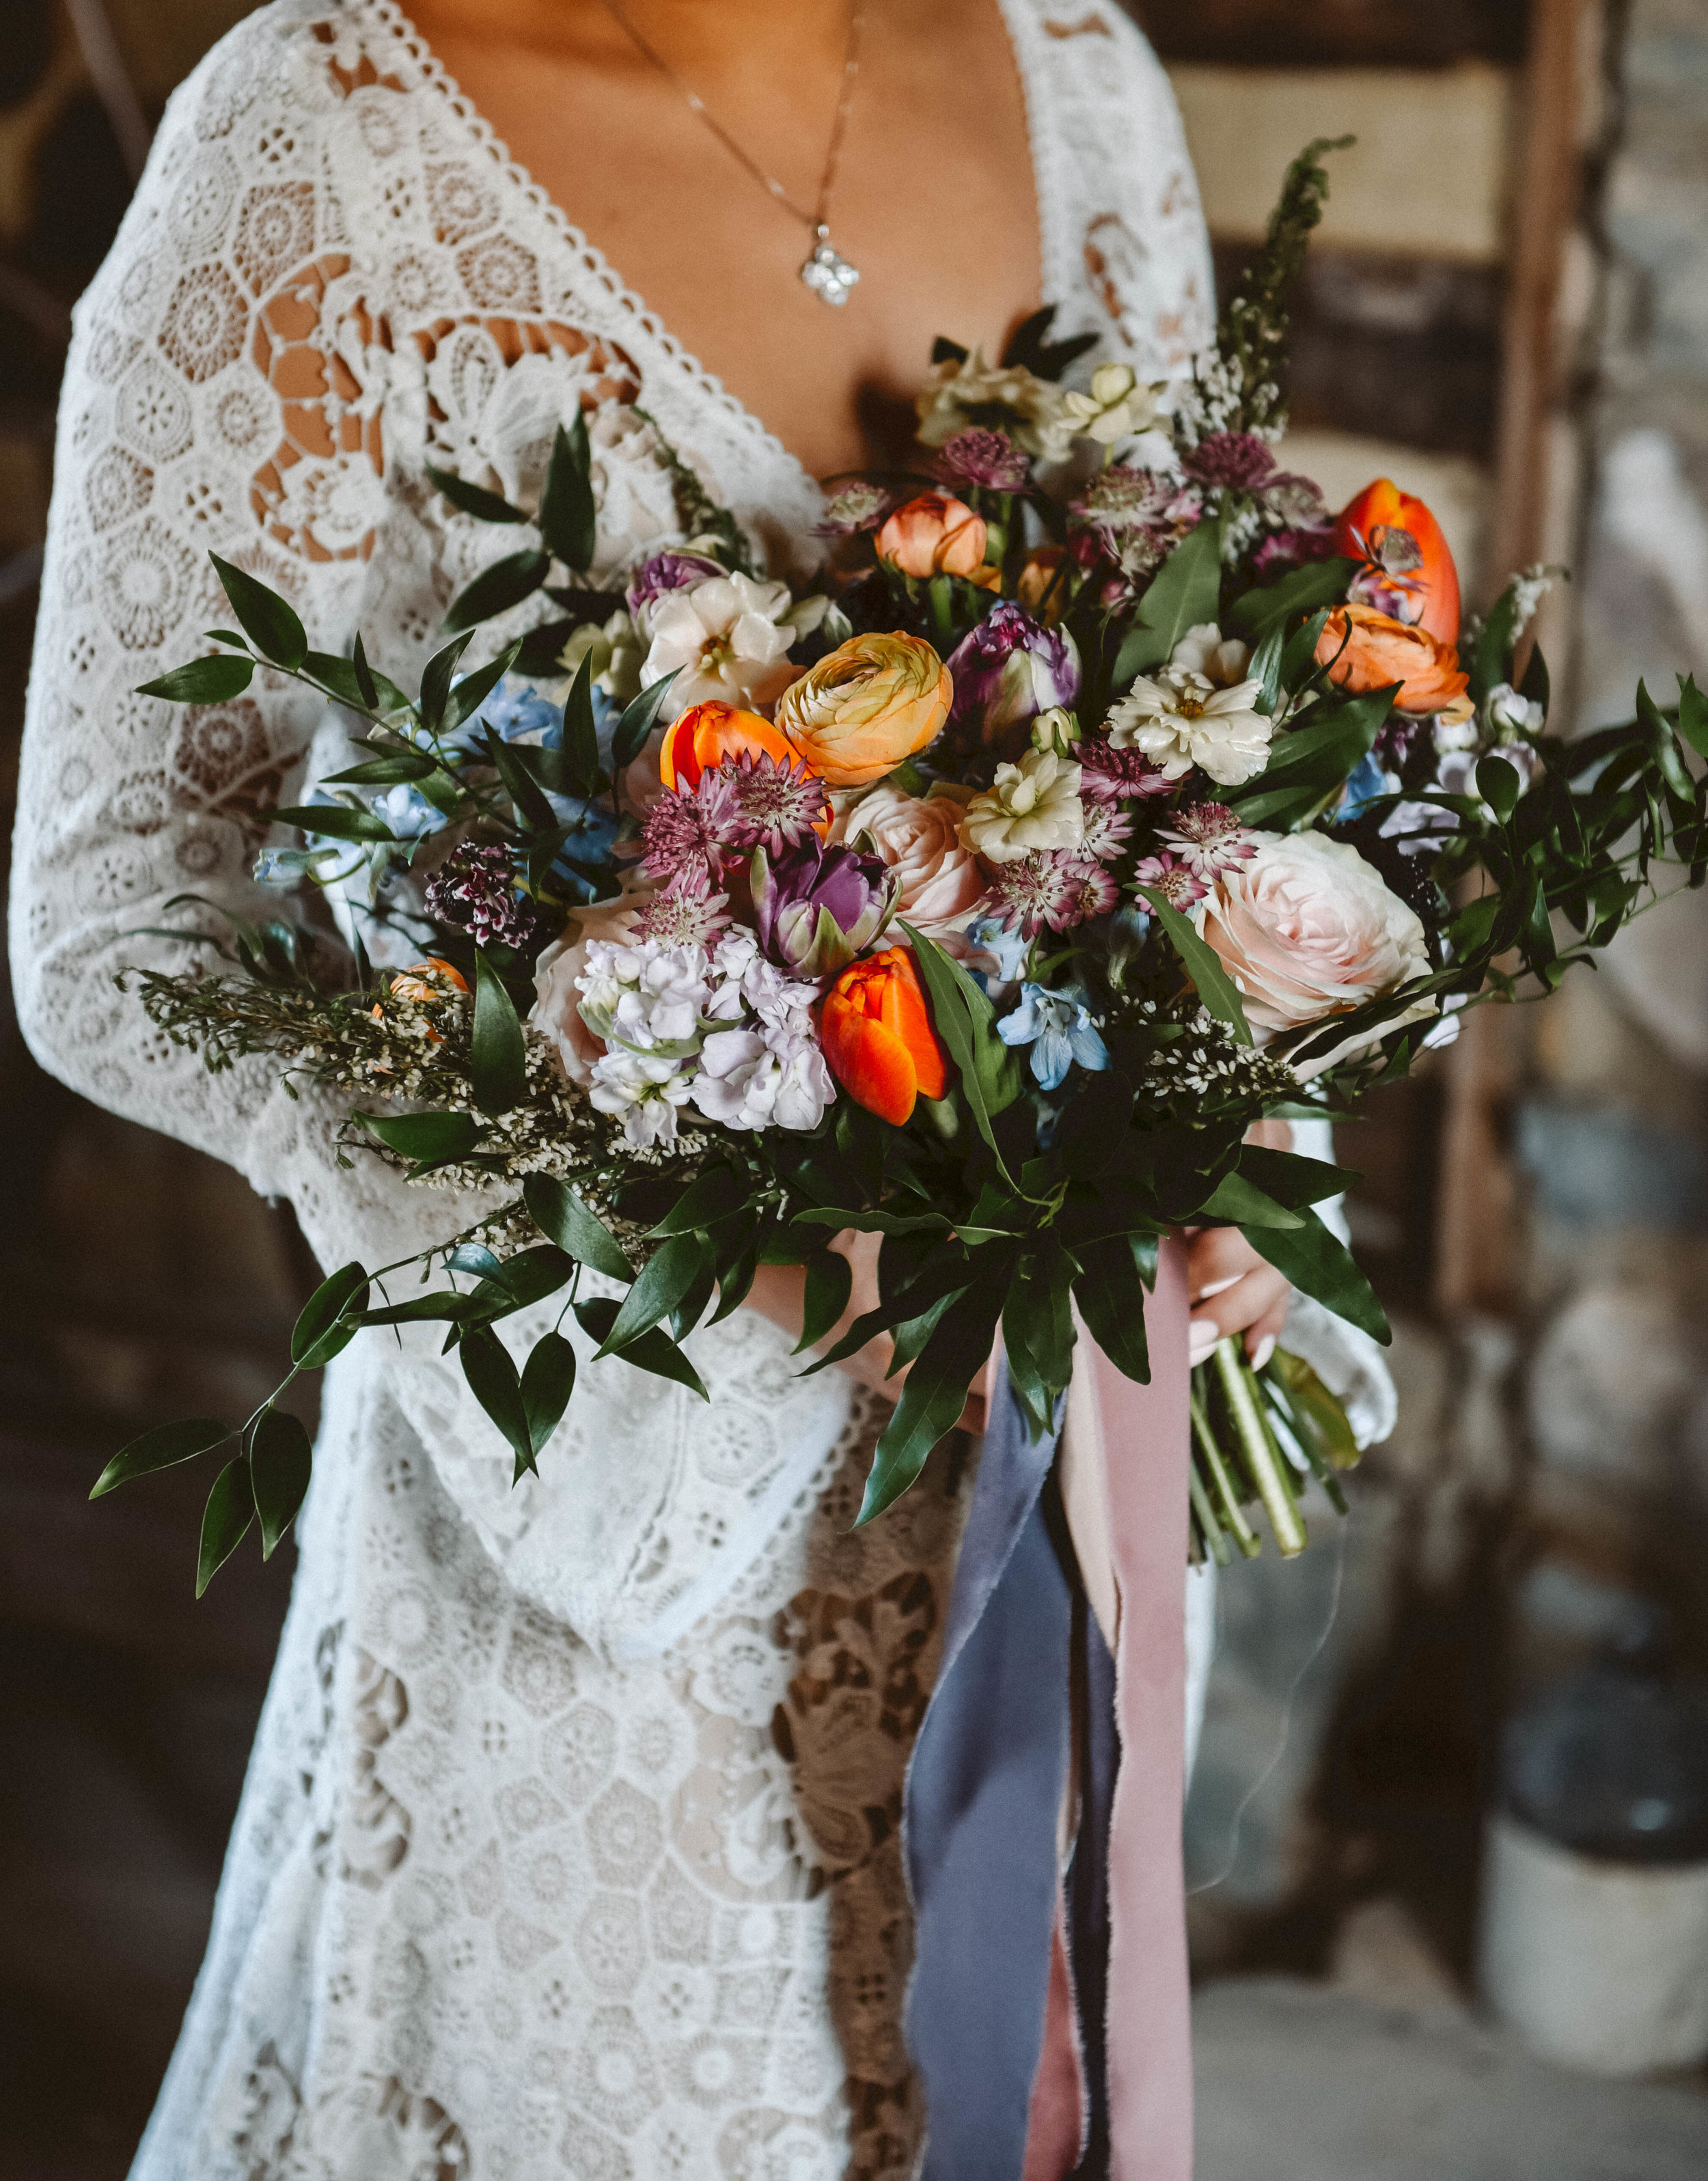 Boho Wedding Wedding Blog Inspiration And Advice To Plan The Perfect Wedding